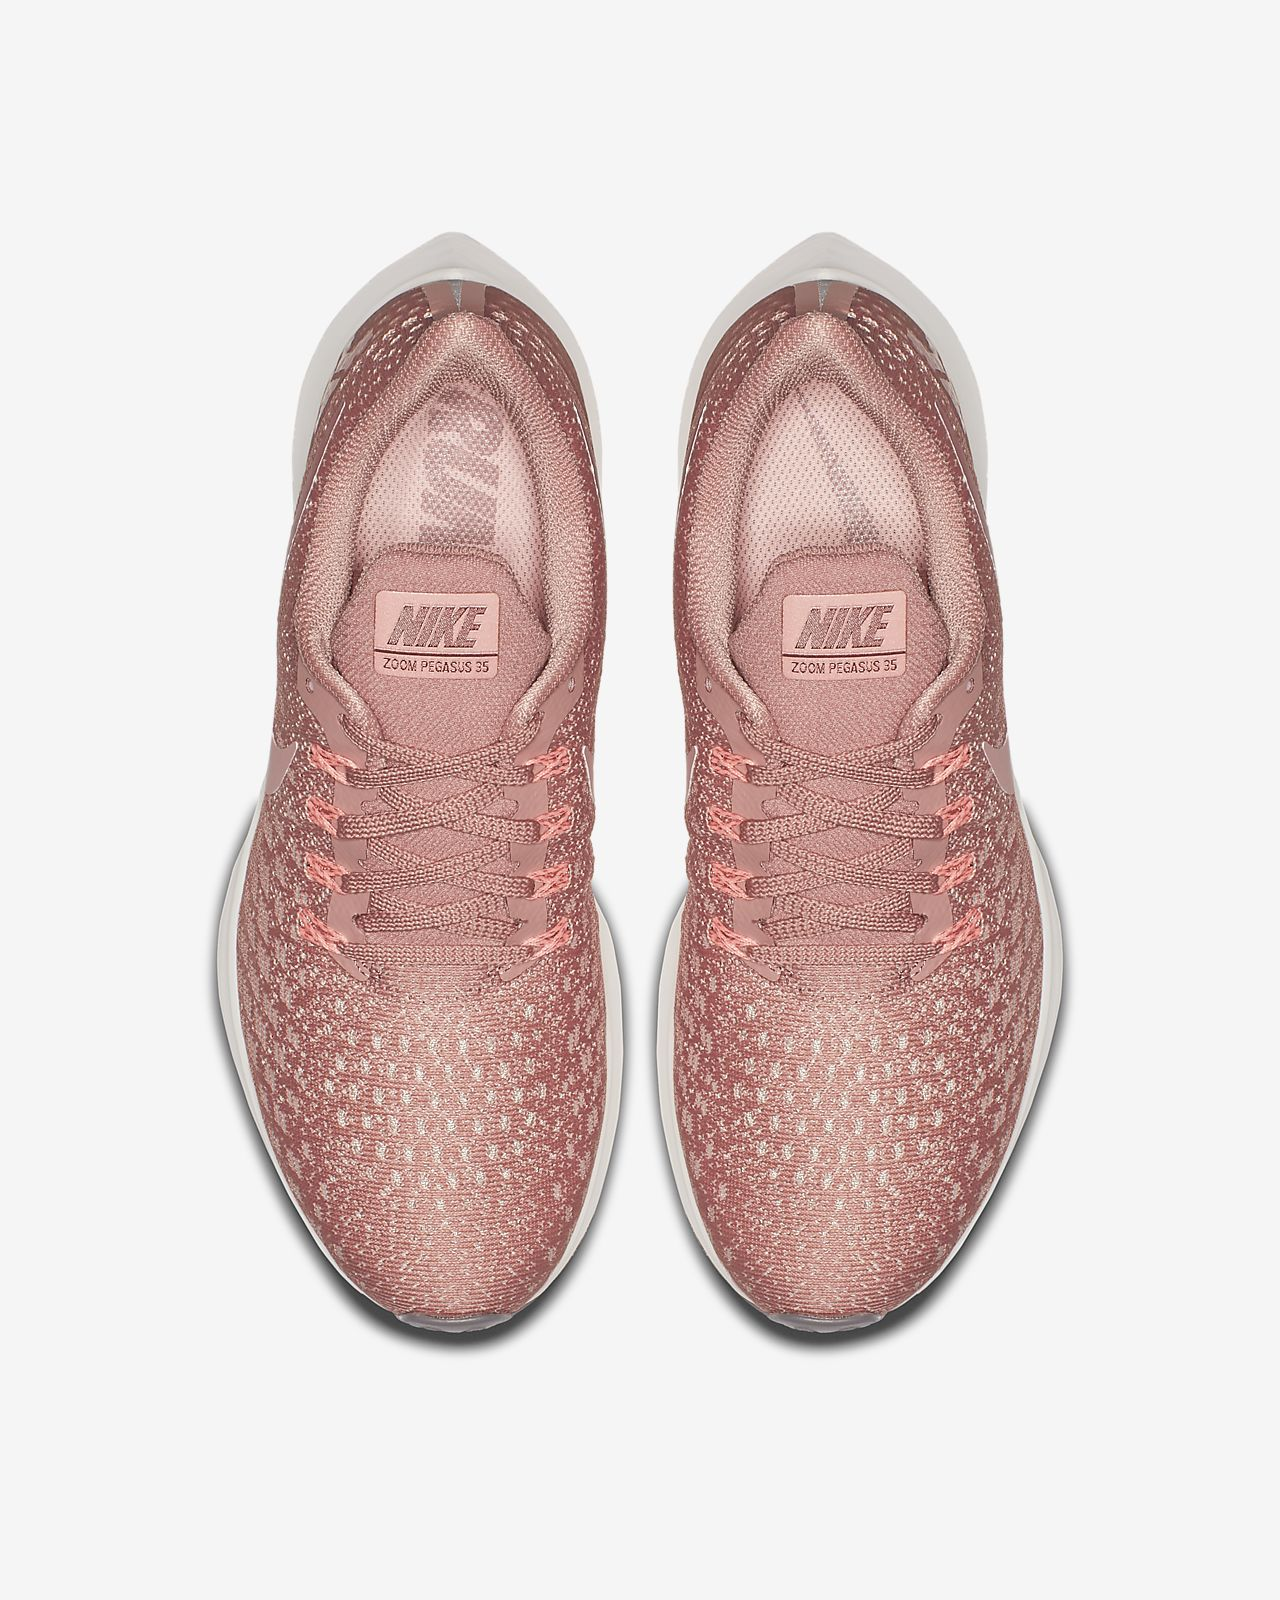 96ca4f177b9 Nike Air Zoom Pegasus 35 Women s Running Shoe. Nike.com IE